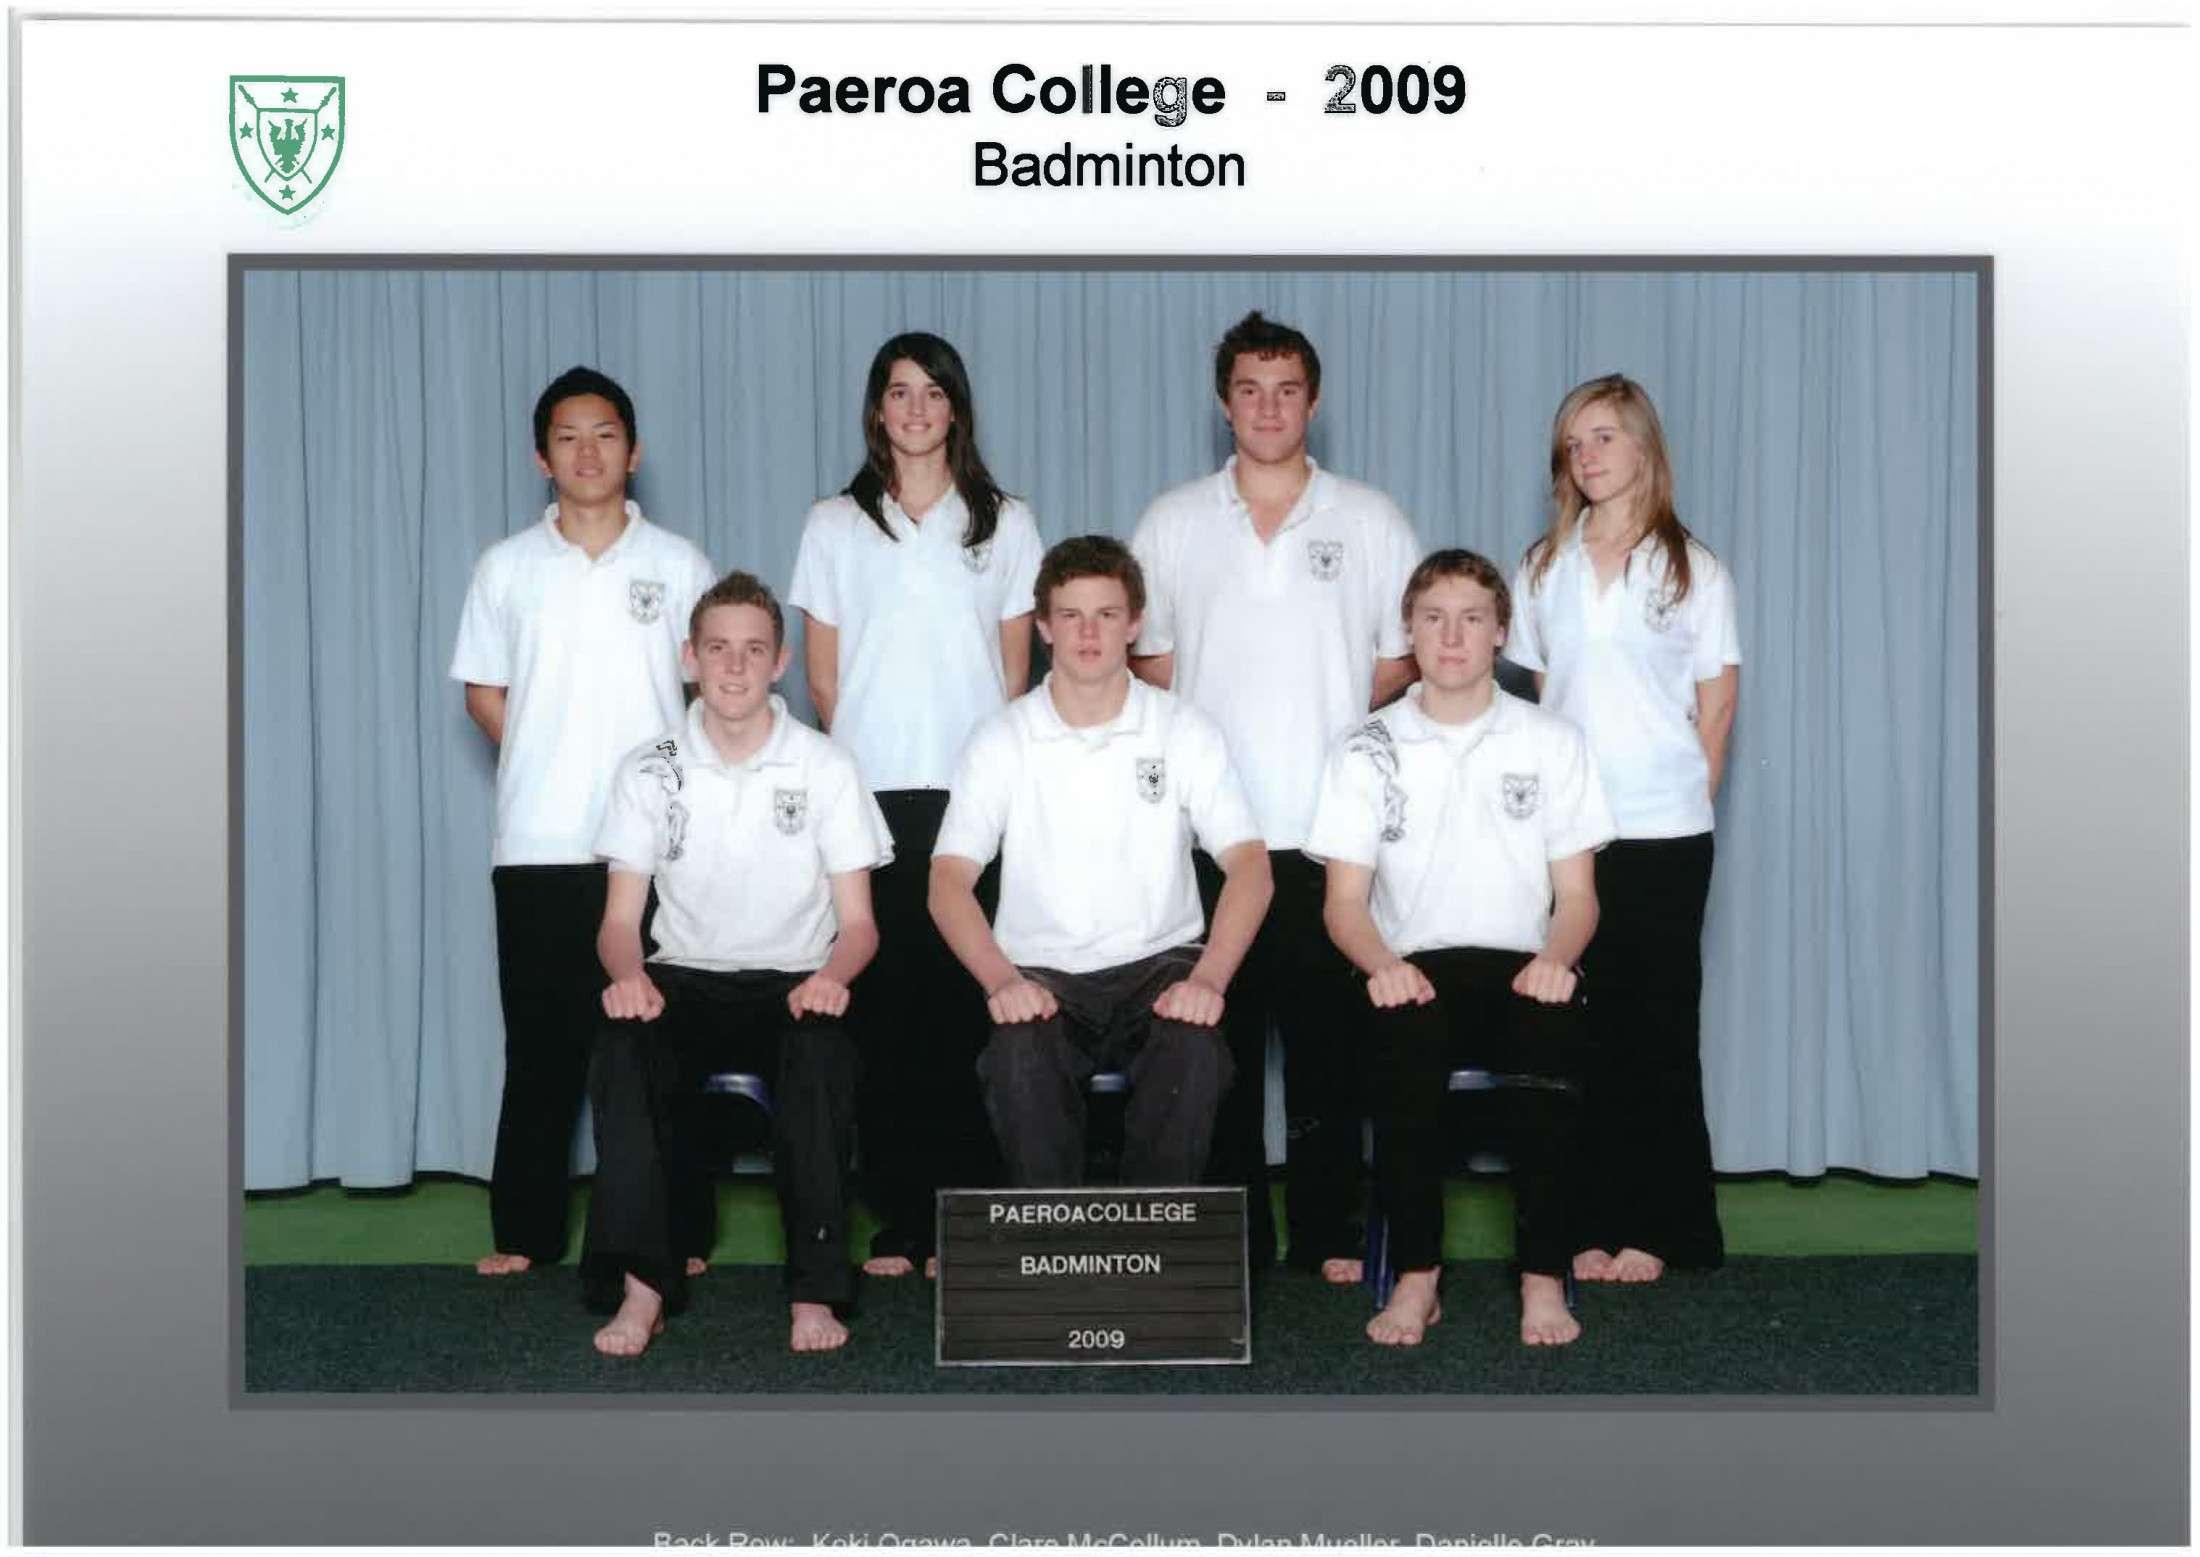 2009 Badminton